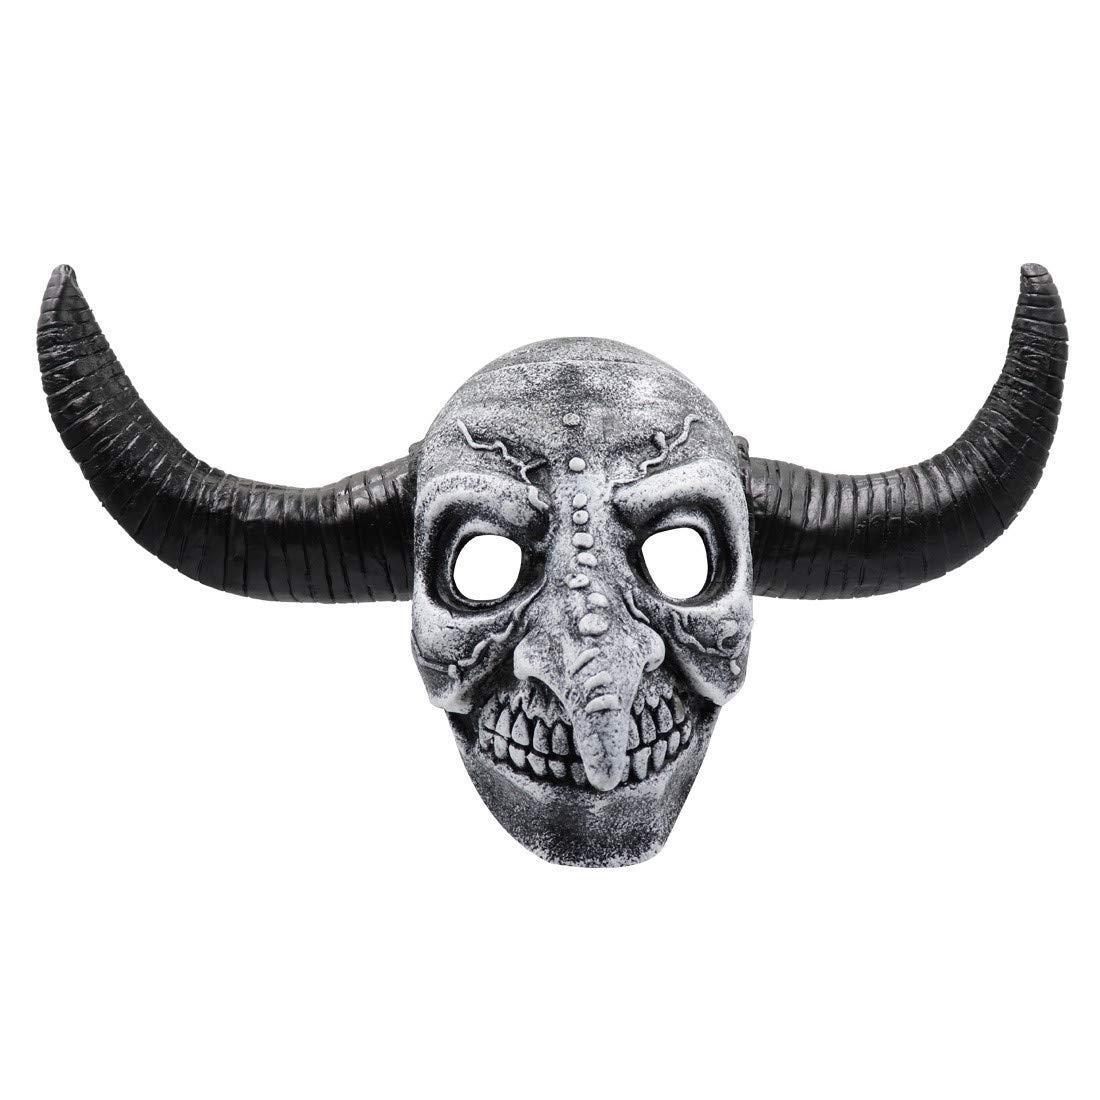 Meetsunshine Halloween Halloween Mask, Latex Mask Scary Animal Cattle Horns Masquerade Costume Cosplay Dress Up Props by Meetsunshine Halloween